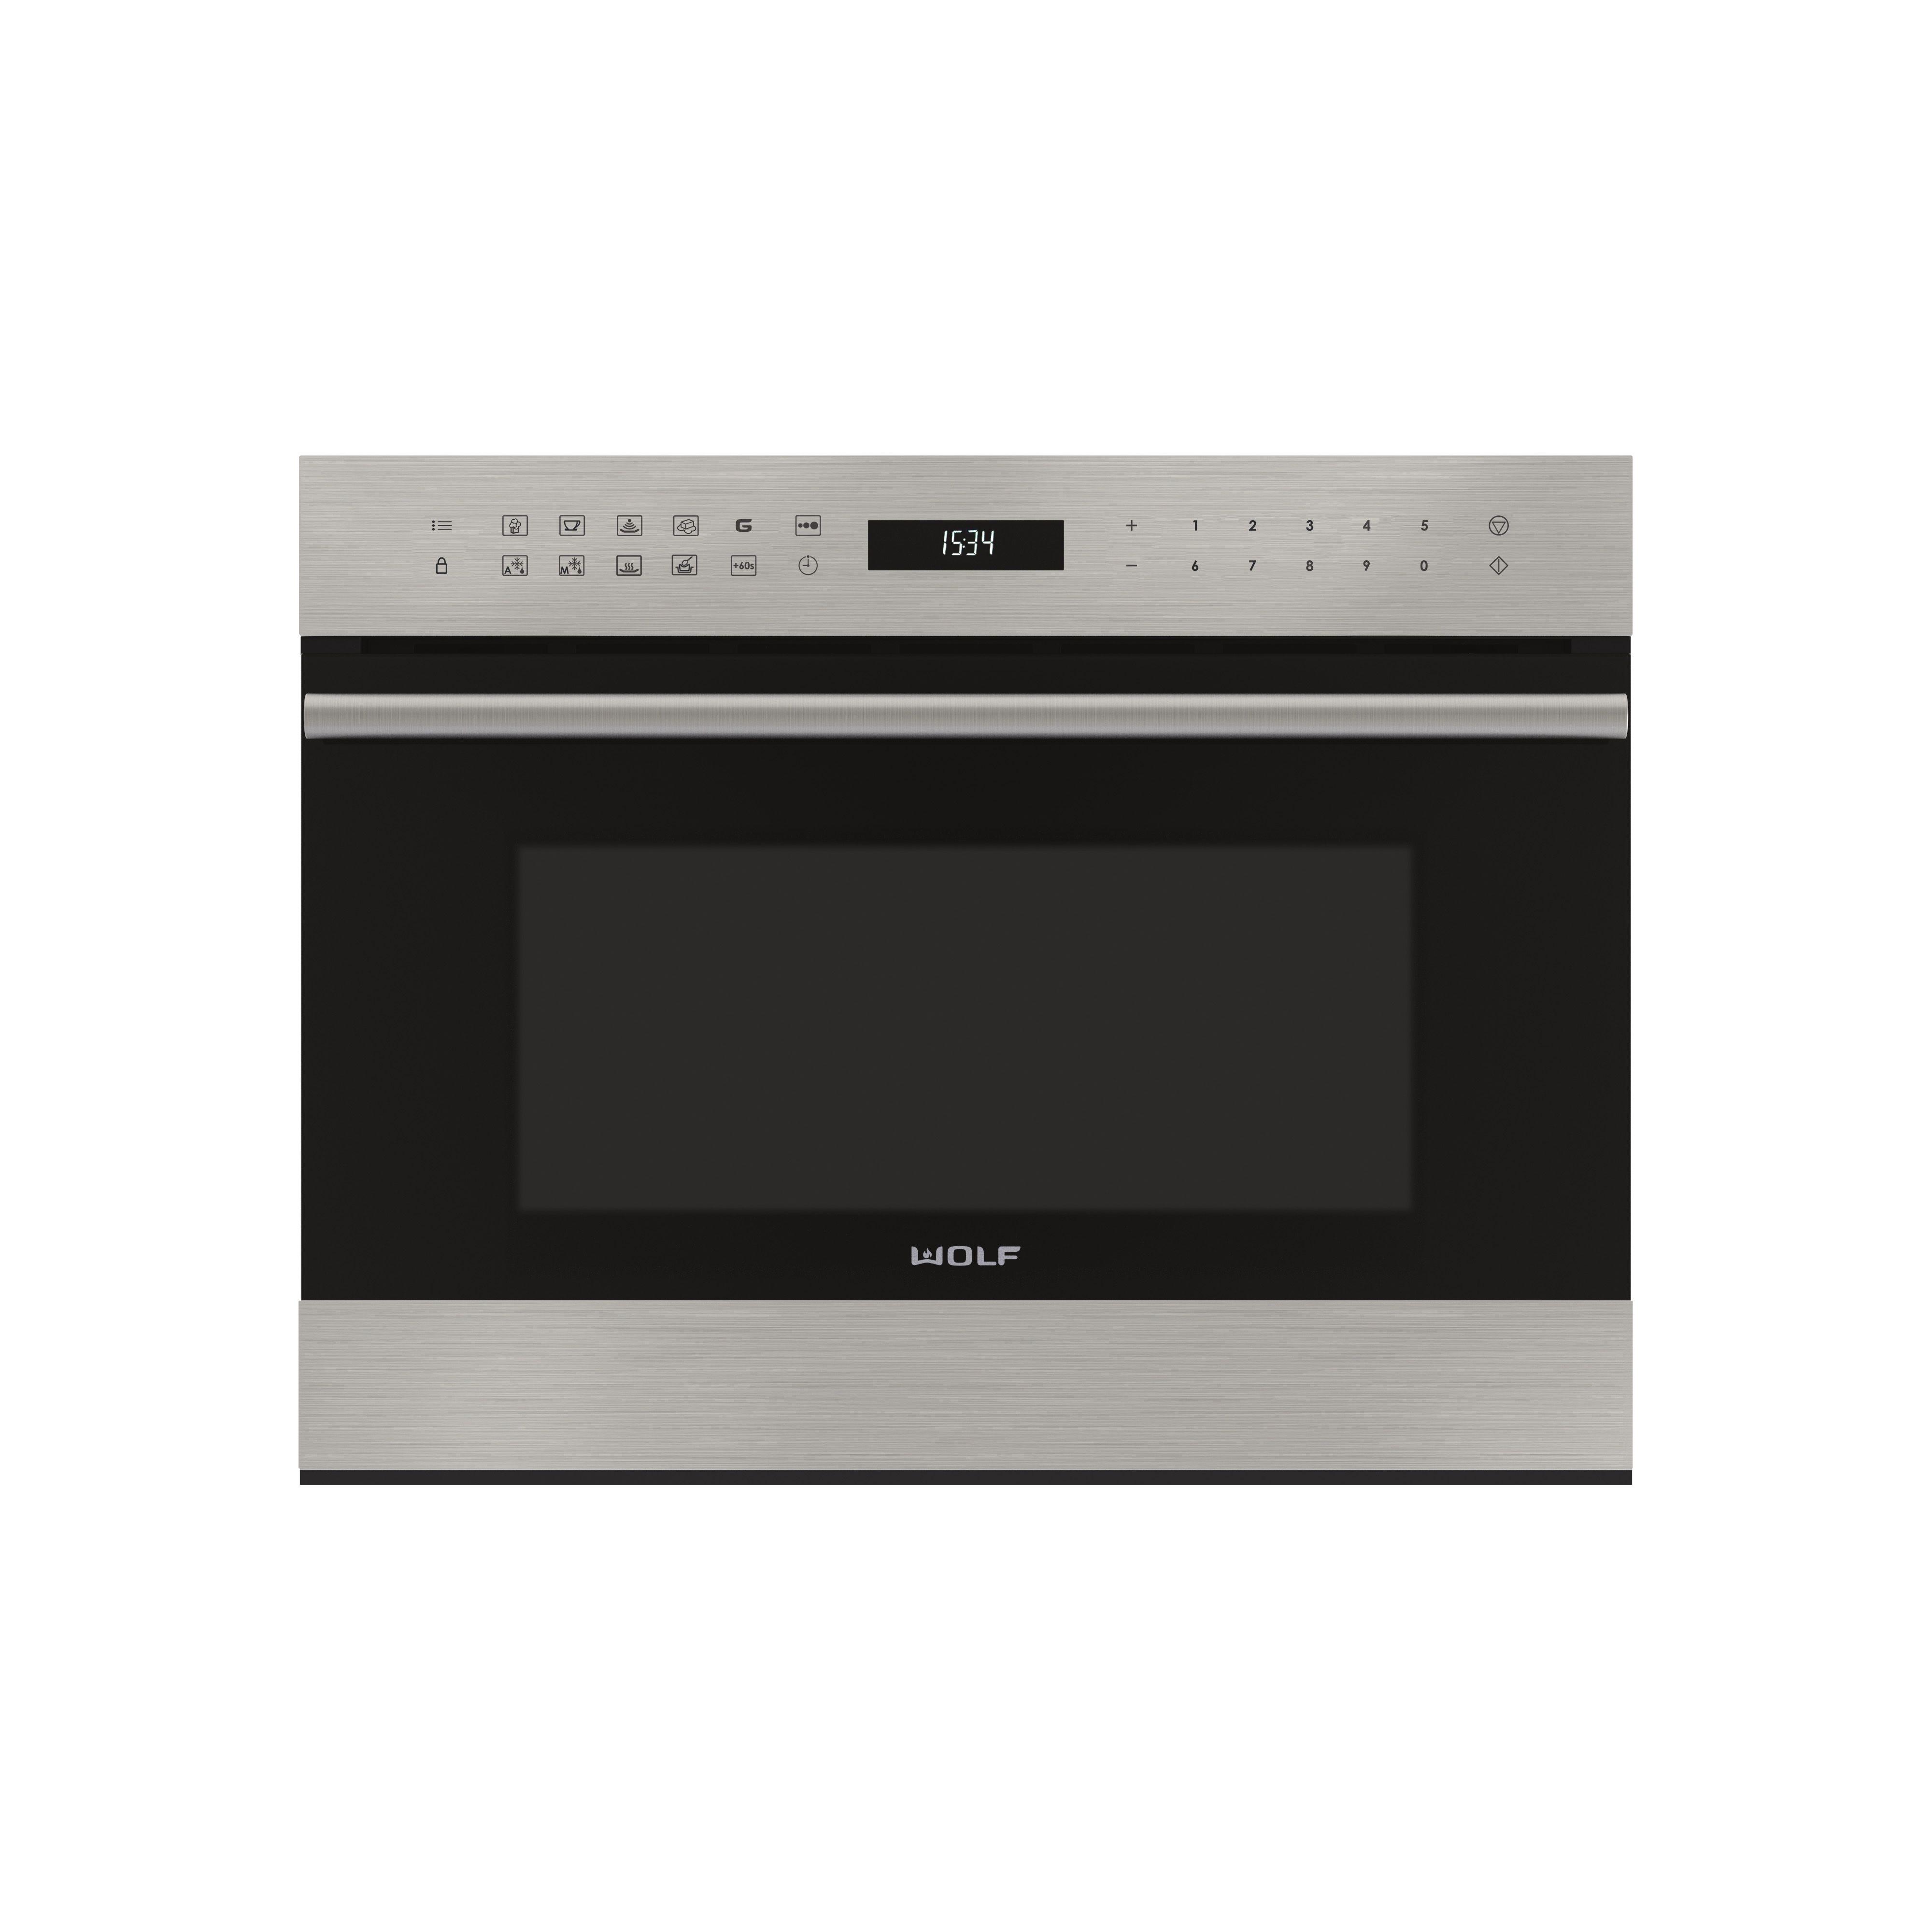 24 E Series Transitional Drop Down Door Microwave Oven Microwave Oven Steam Oven Microwave